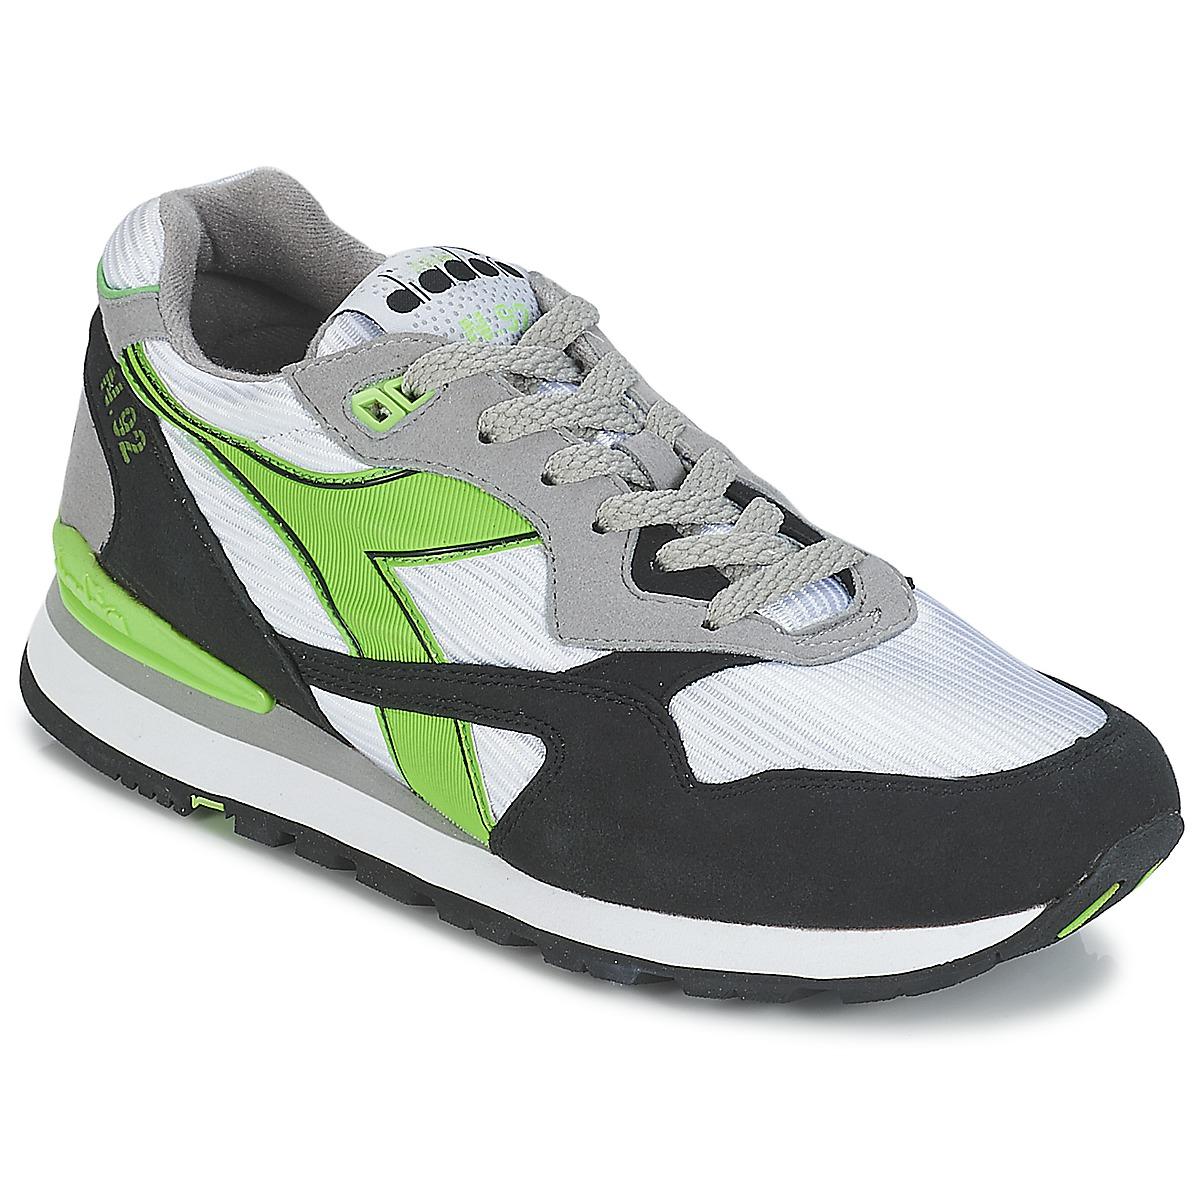 Diadora N-92 Weiss / Schwarz / Grün - Kostenloser Versand bei Spartoode ! - Schuhe Sneaker Low  42,50 €